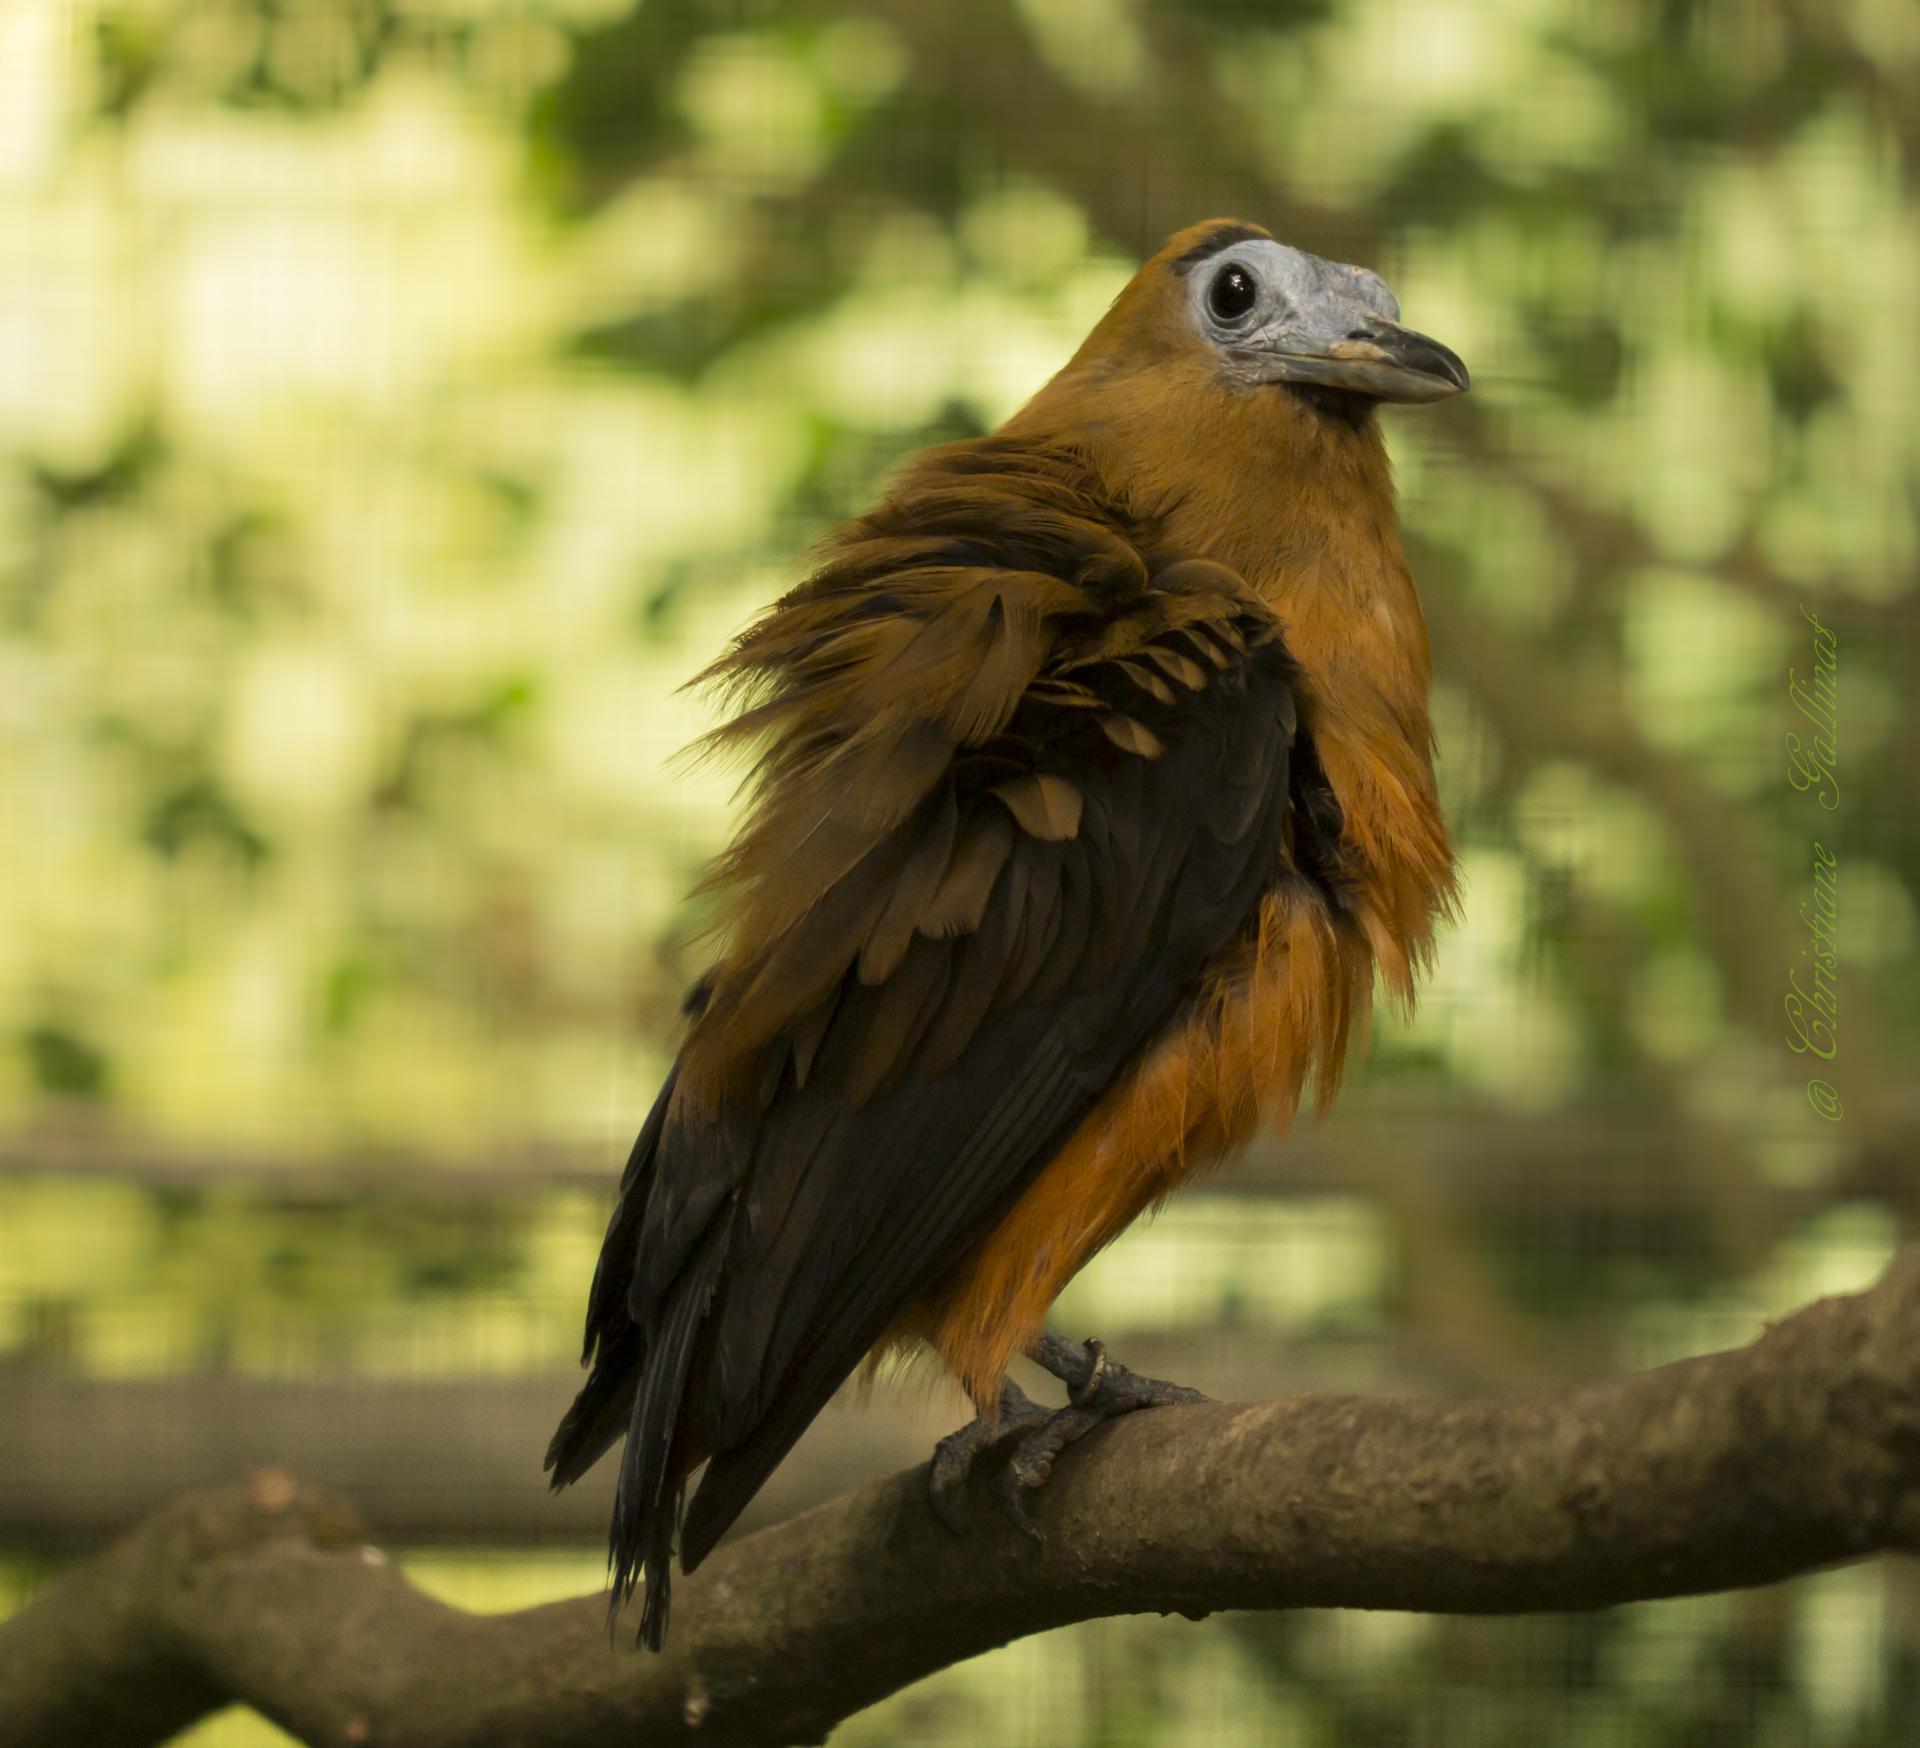 Capuchinbird/Kapuzintinga